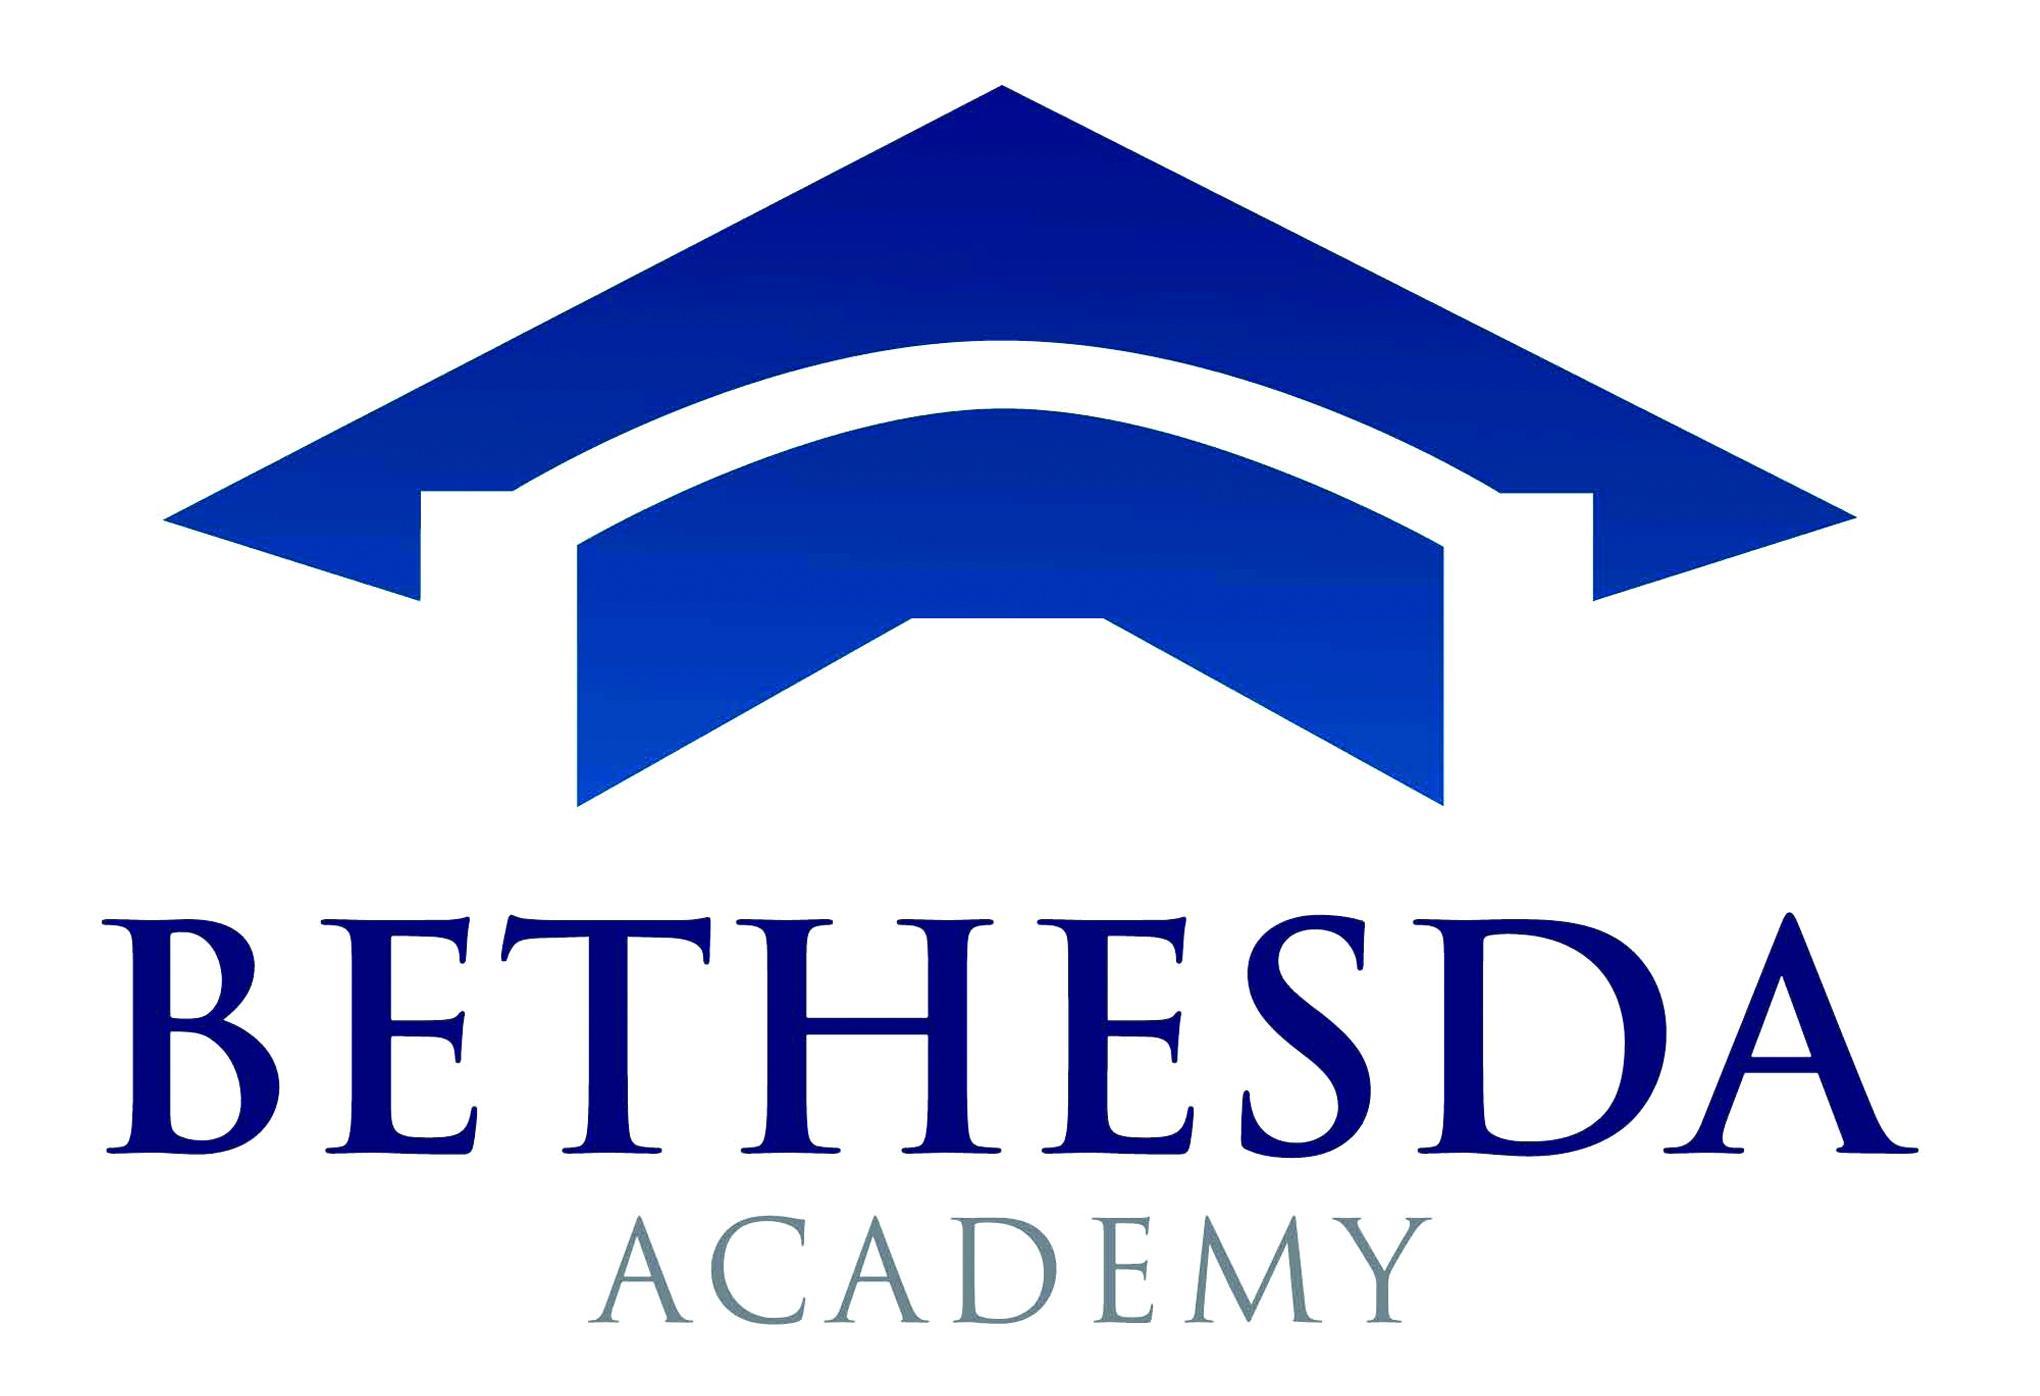 Bethesda Academy - hi res.jpg